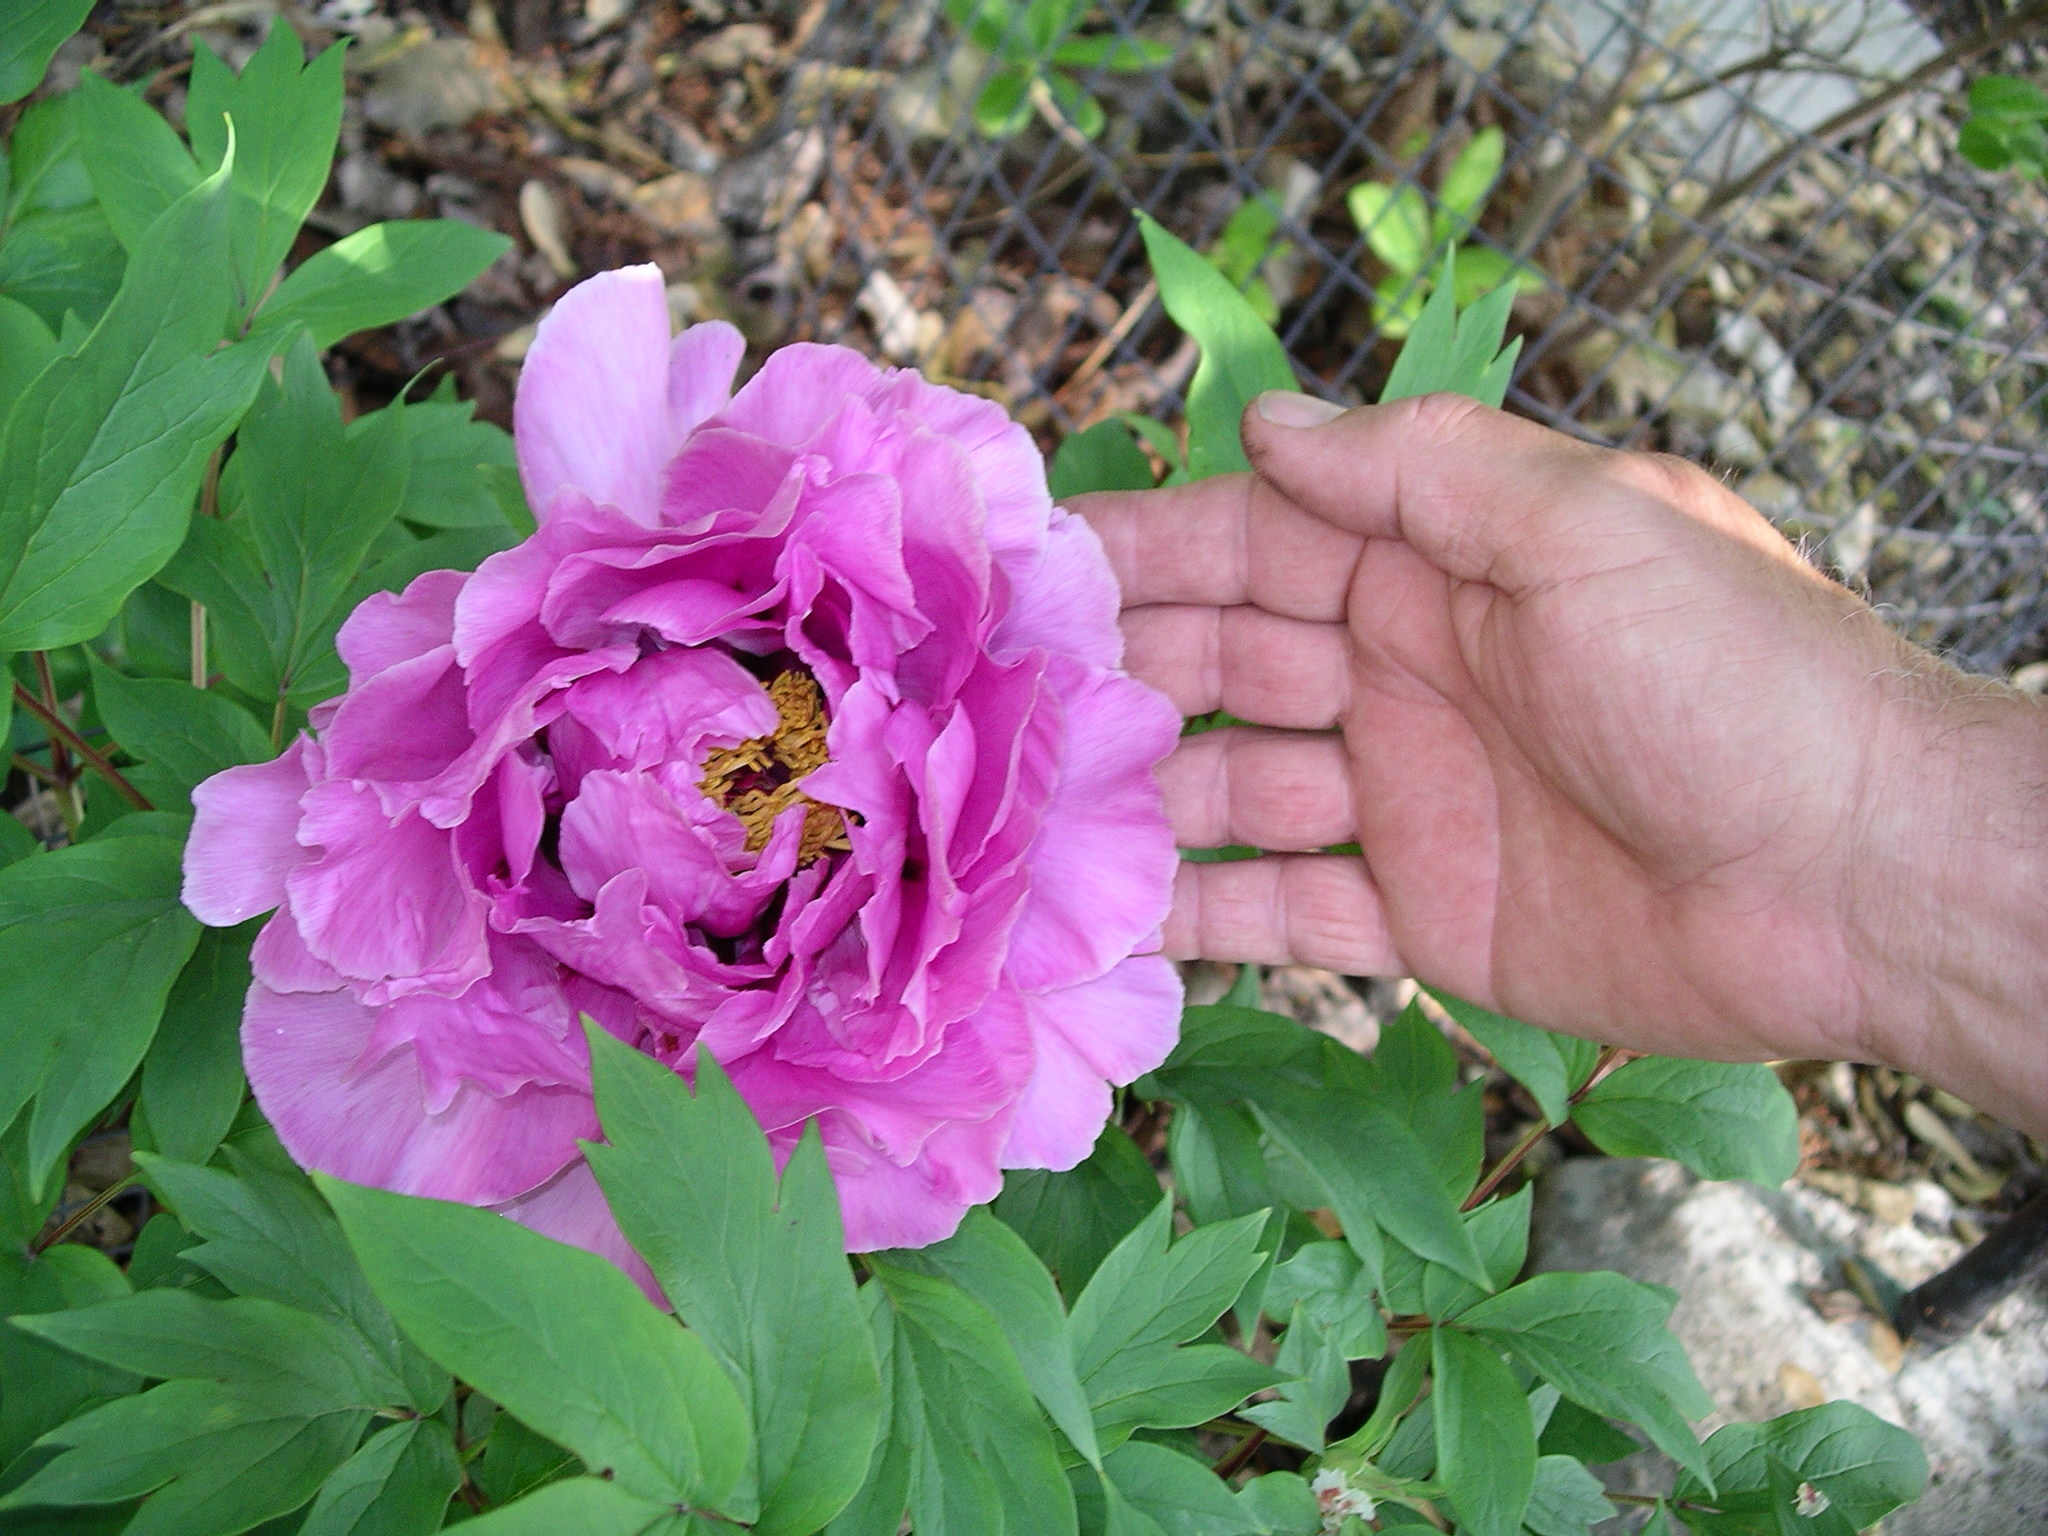 052804+flower+3+tree+peony.jpg.JPG